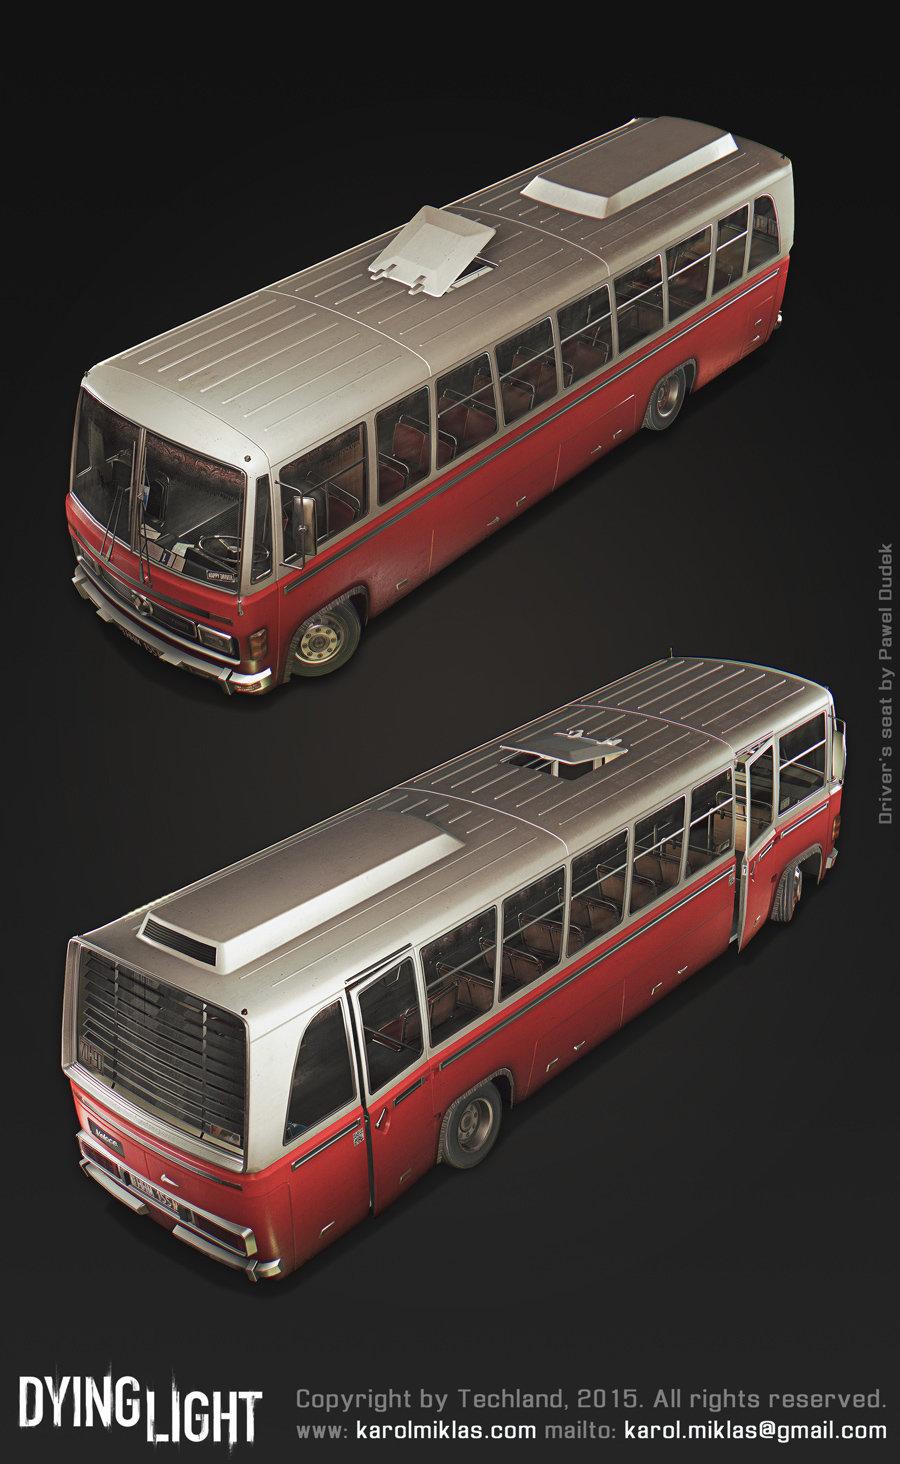 karol-miklas-new-bus-b-1.jpg